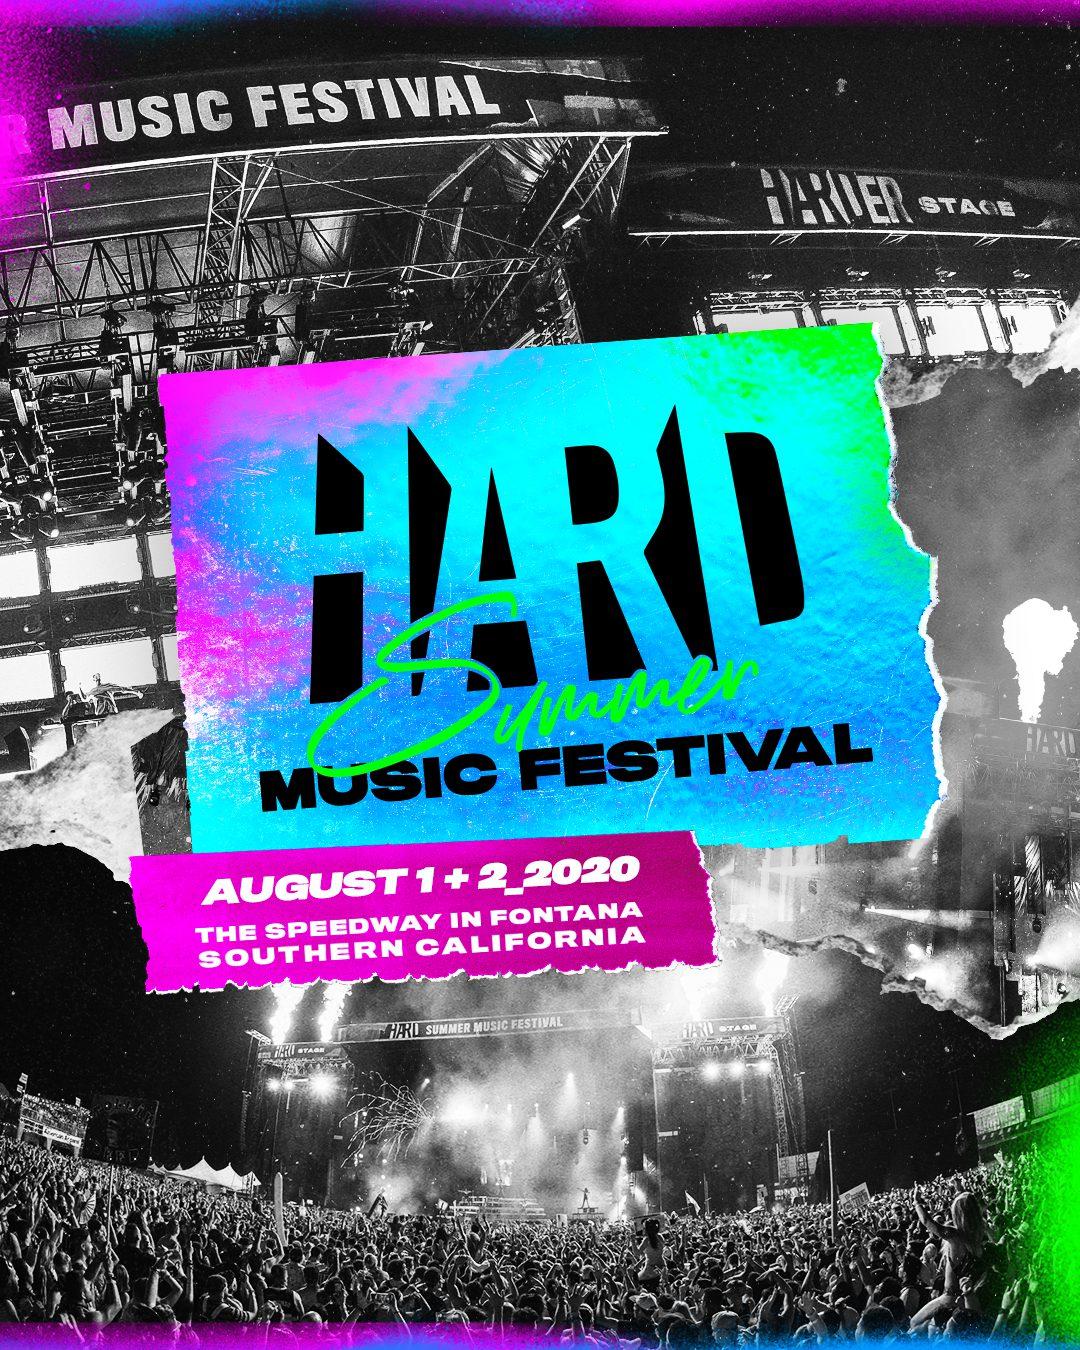 HARD Summer Music Festival 2020 Dates